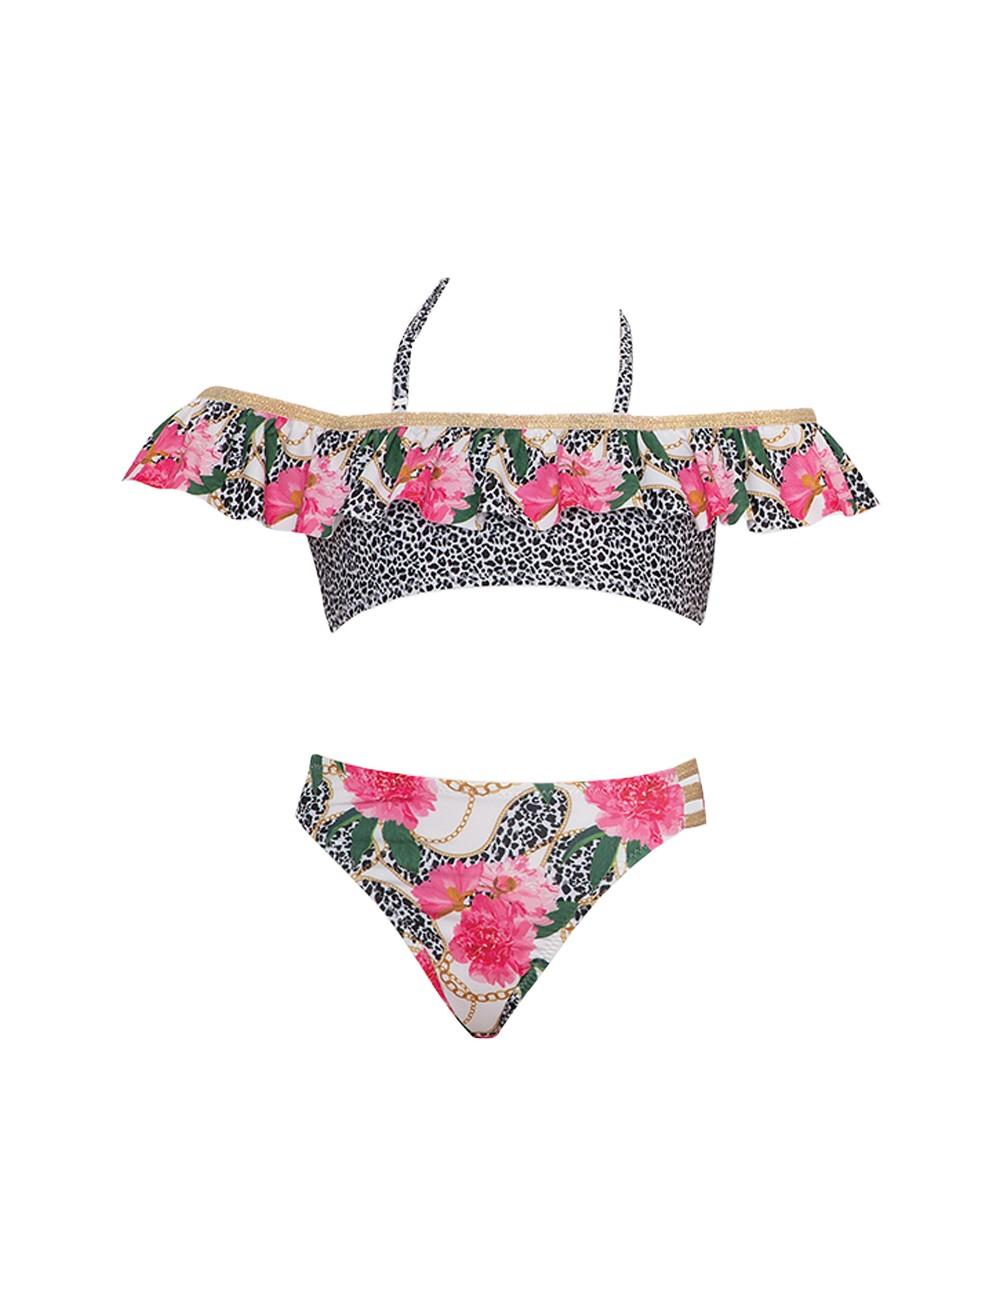 Tortue Παιδικό/ Εφηβικό Μαγιό Strapless Bikini S1-034-126 Lamoda.gr